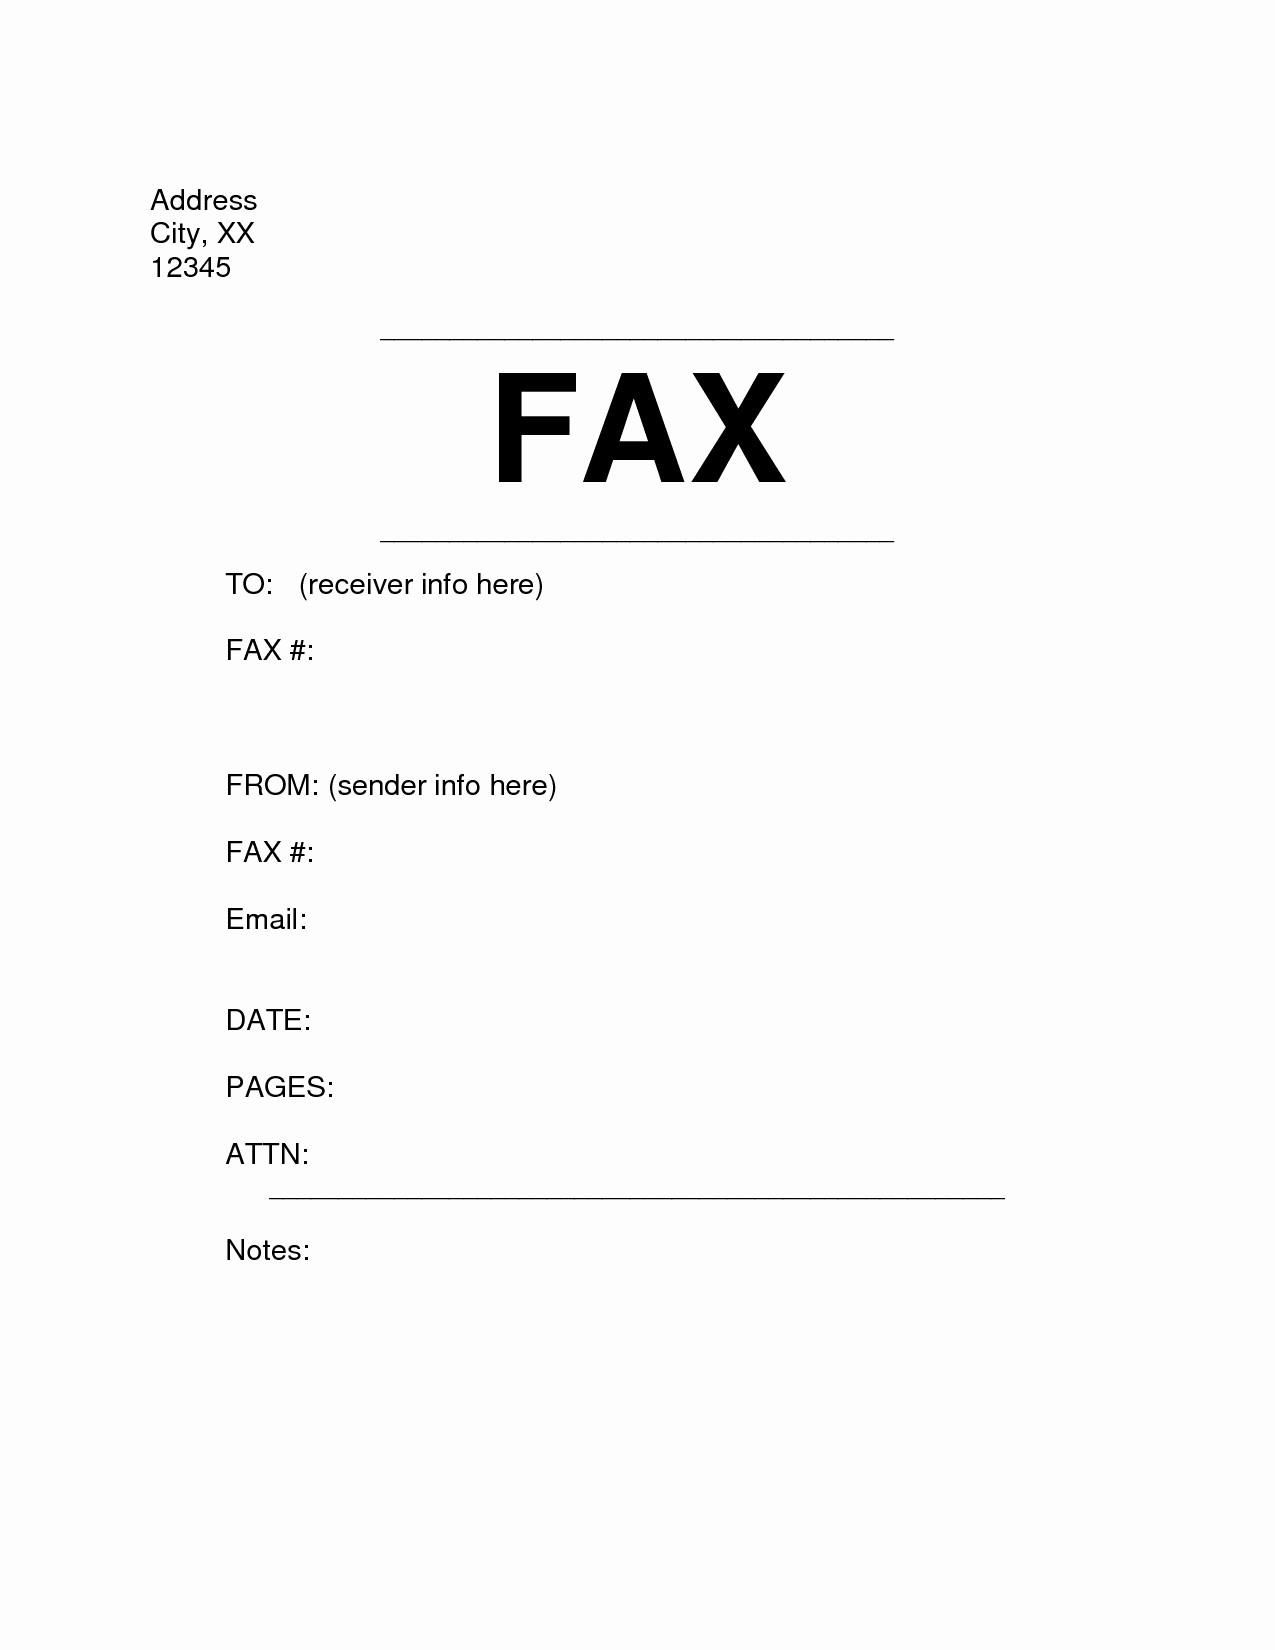 Fax Cover Sheet Template Microsoft Fresh Microsoft Fice Fax Cover Sheet Template